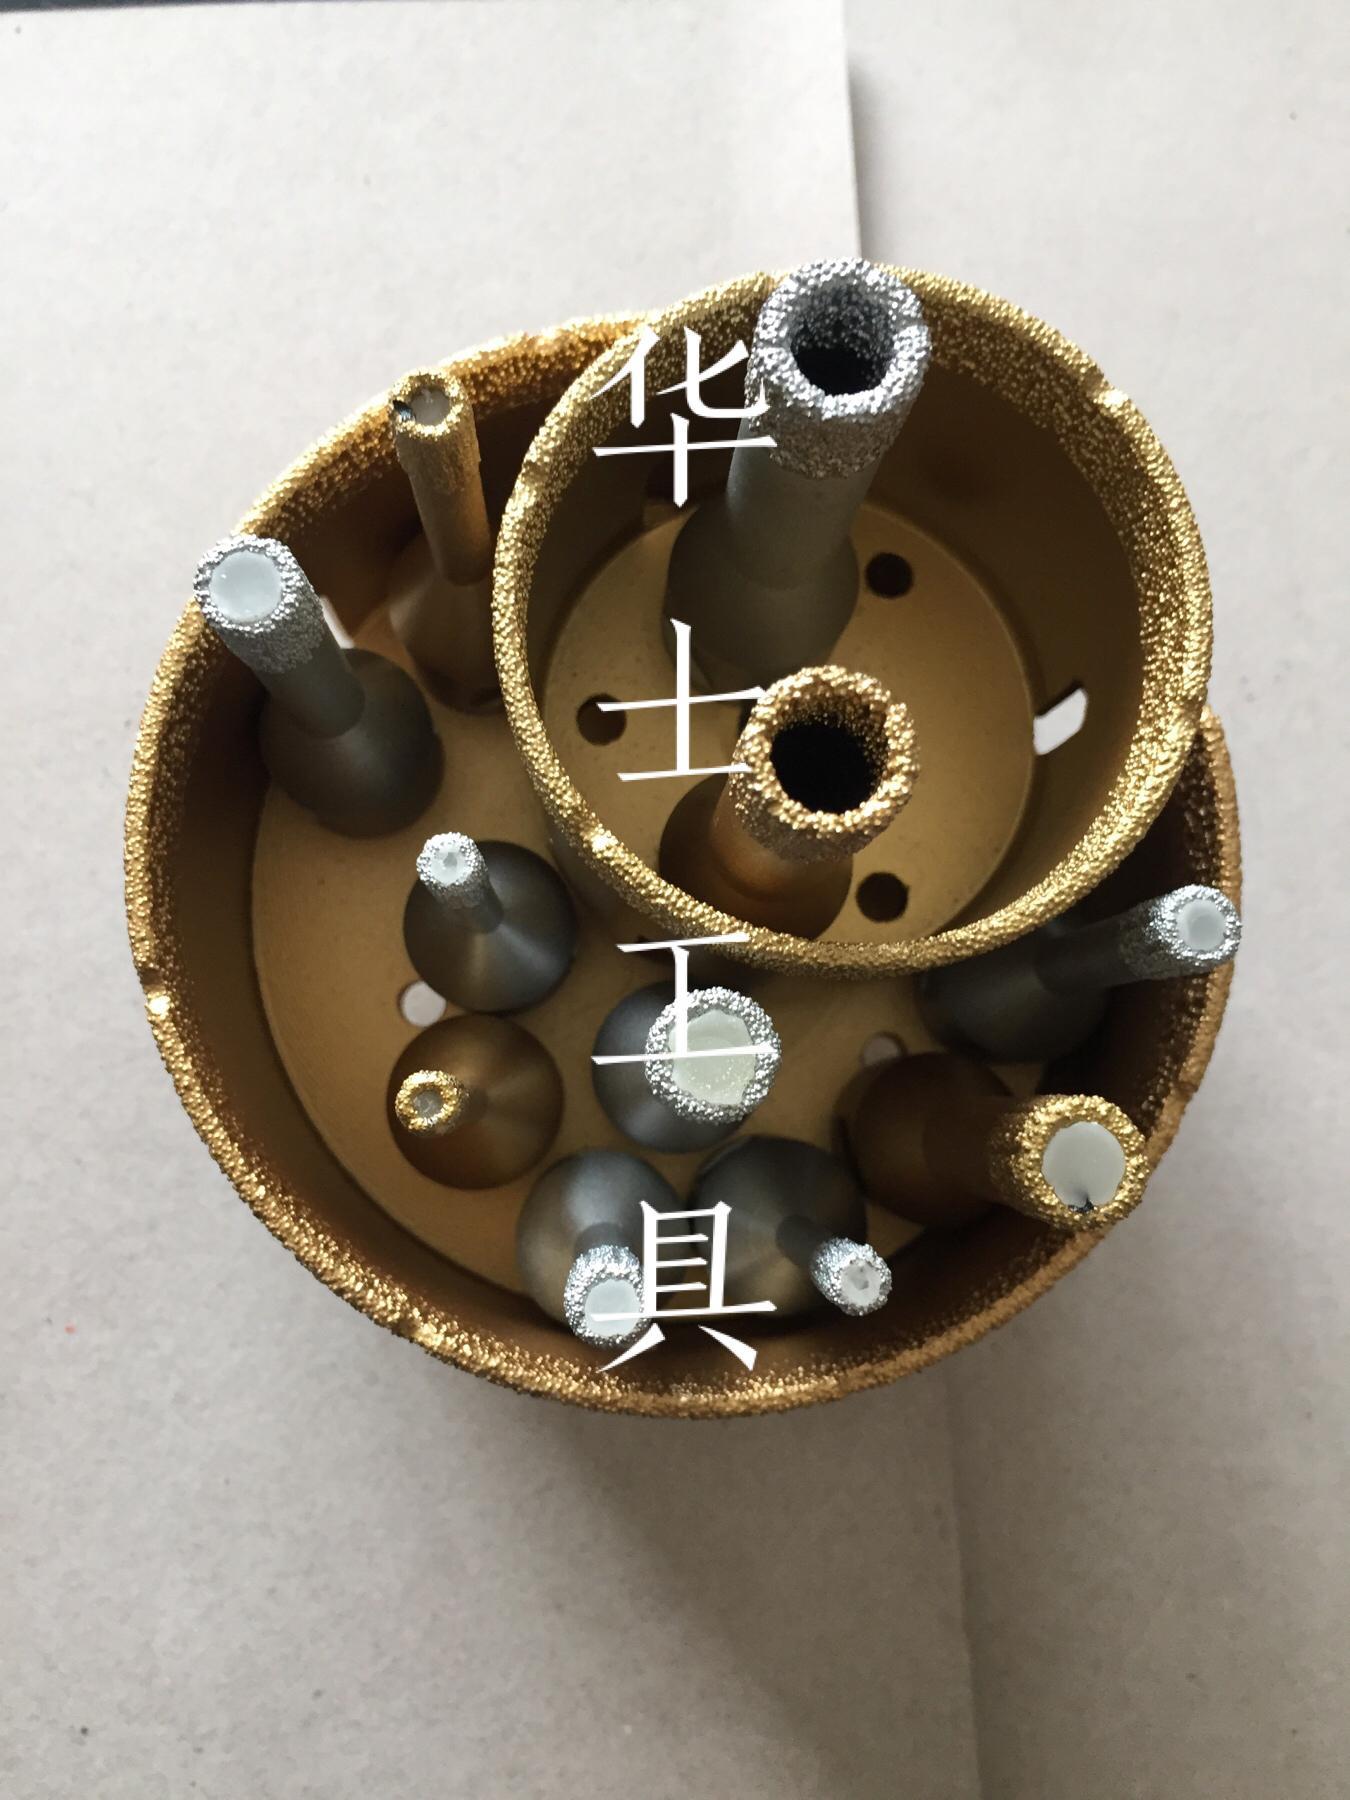 Ceramic tiles-Vb core bit for ceramic 7